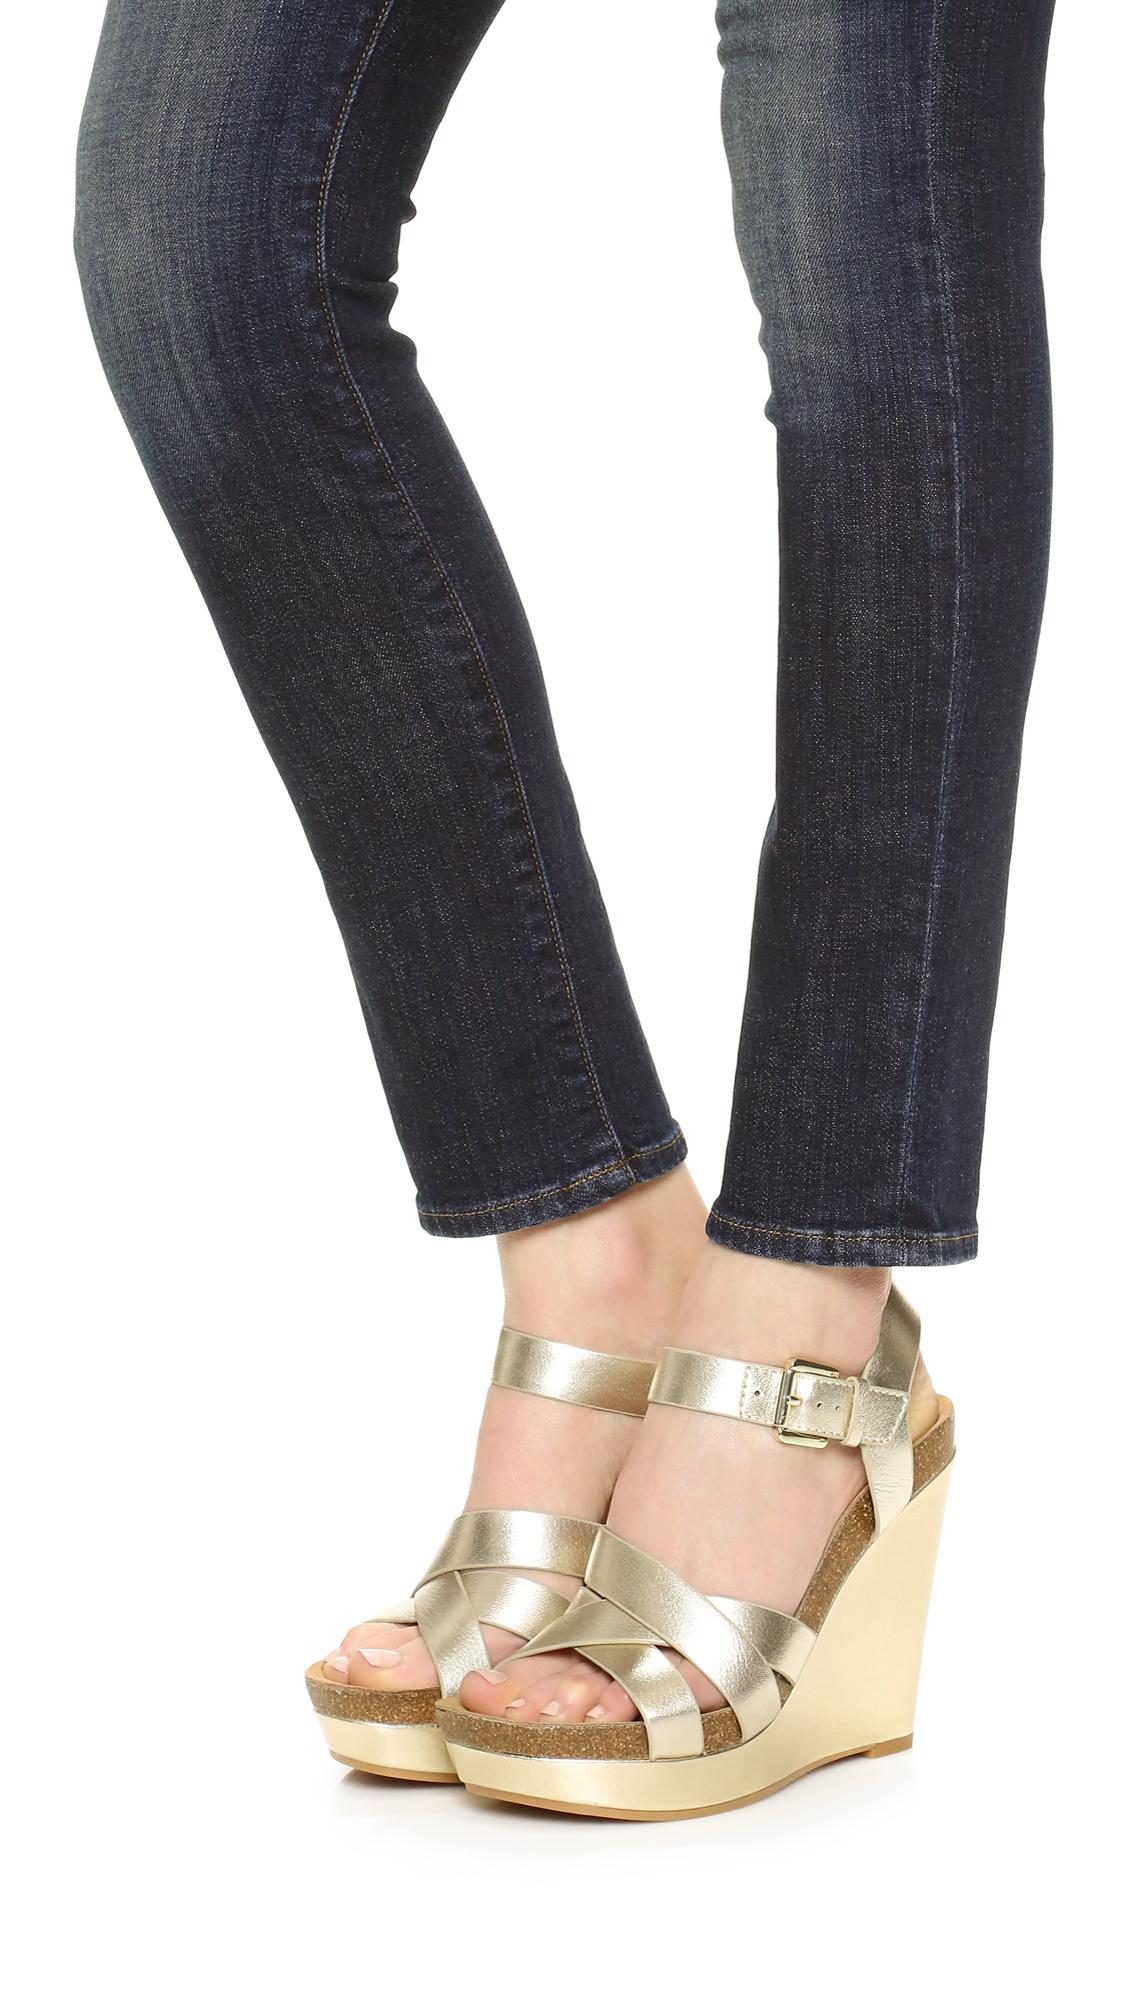 686632fb14aa Sam Edelman Nelson Wedge Sandals in Metallic - Lyst